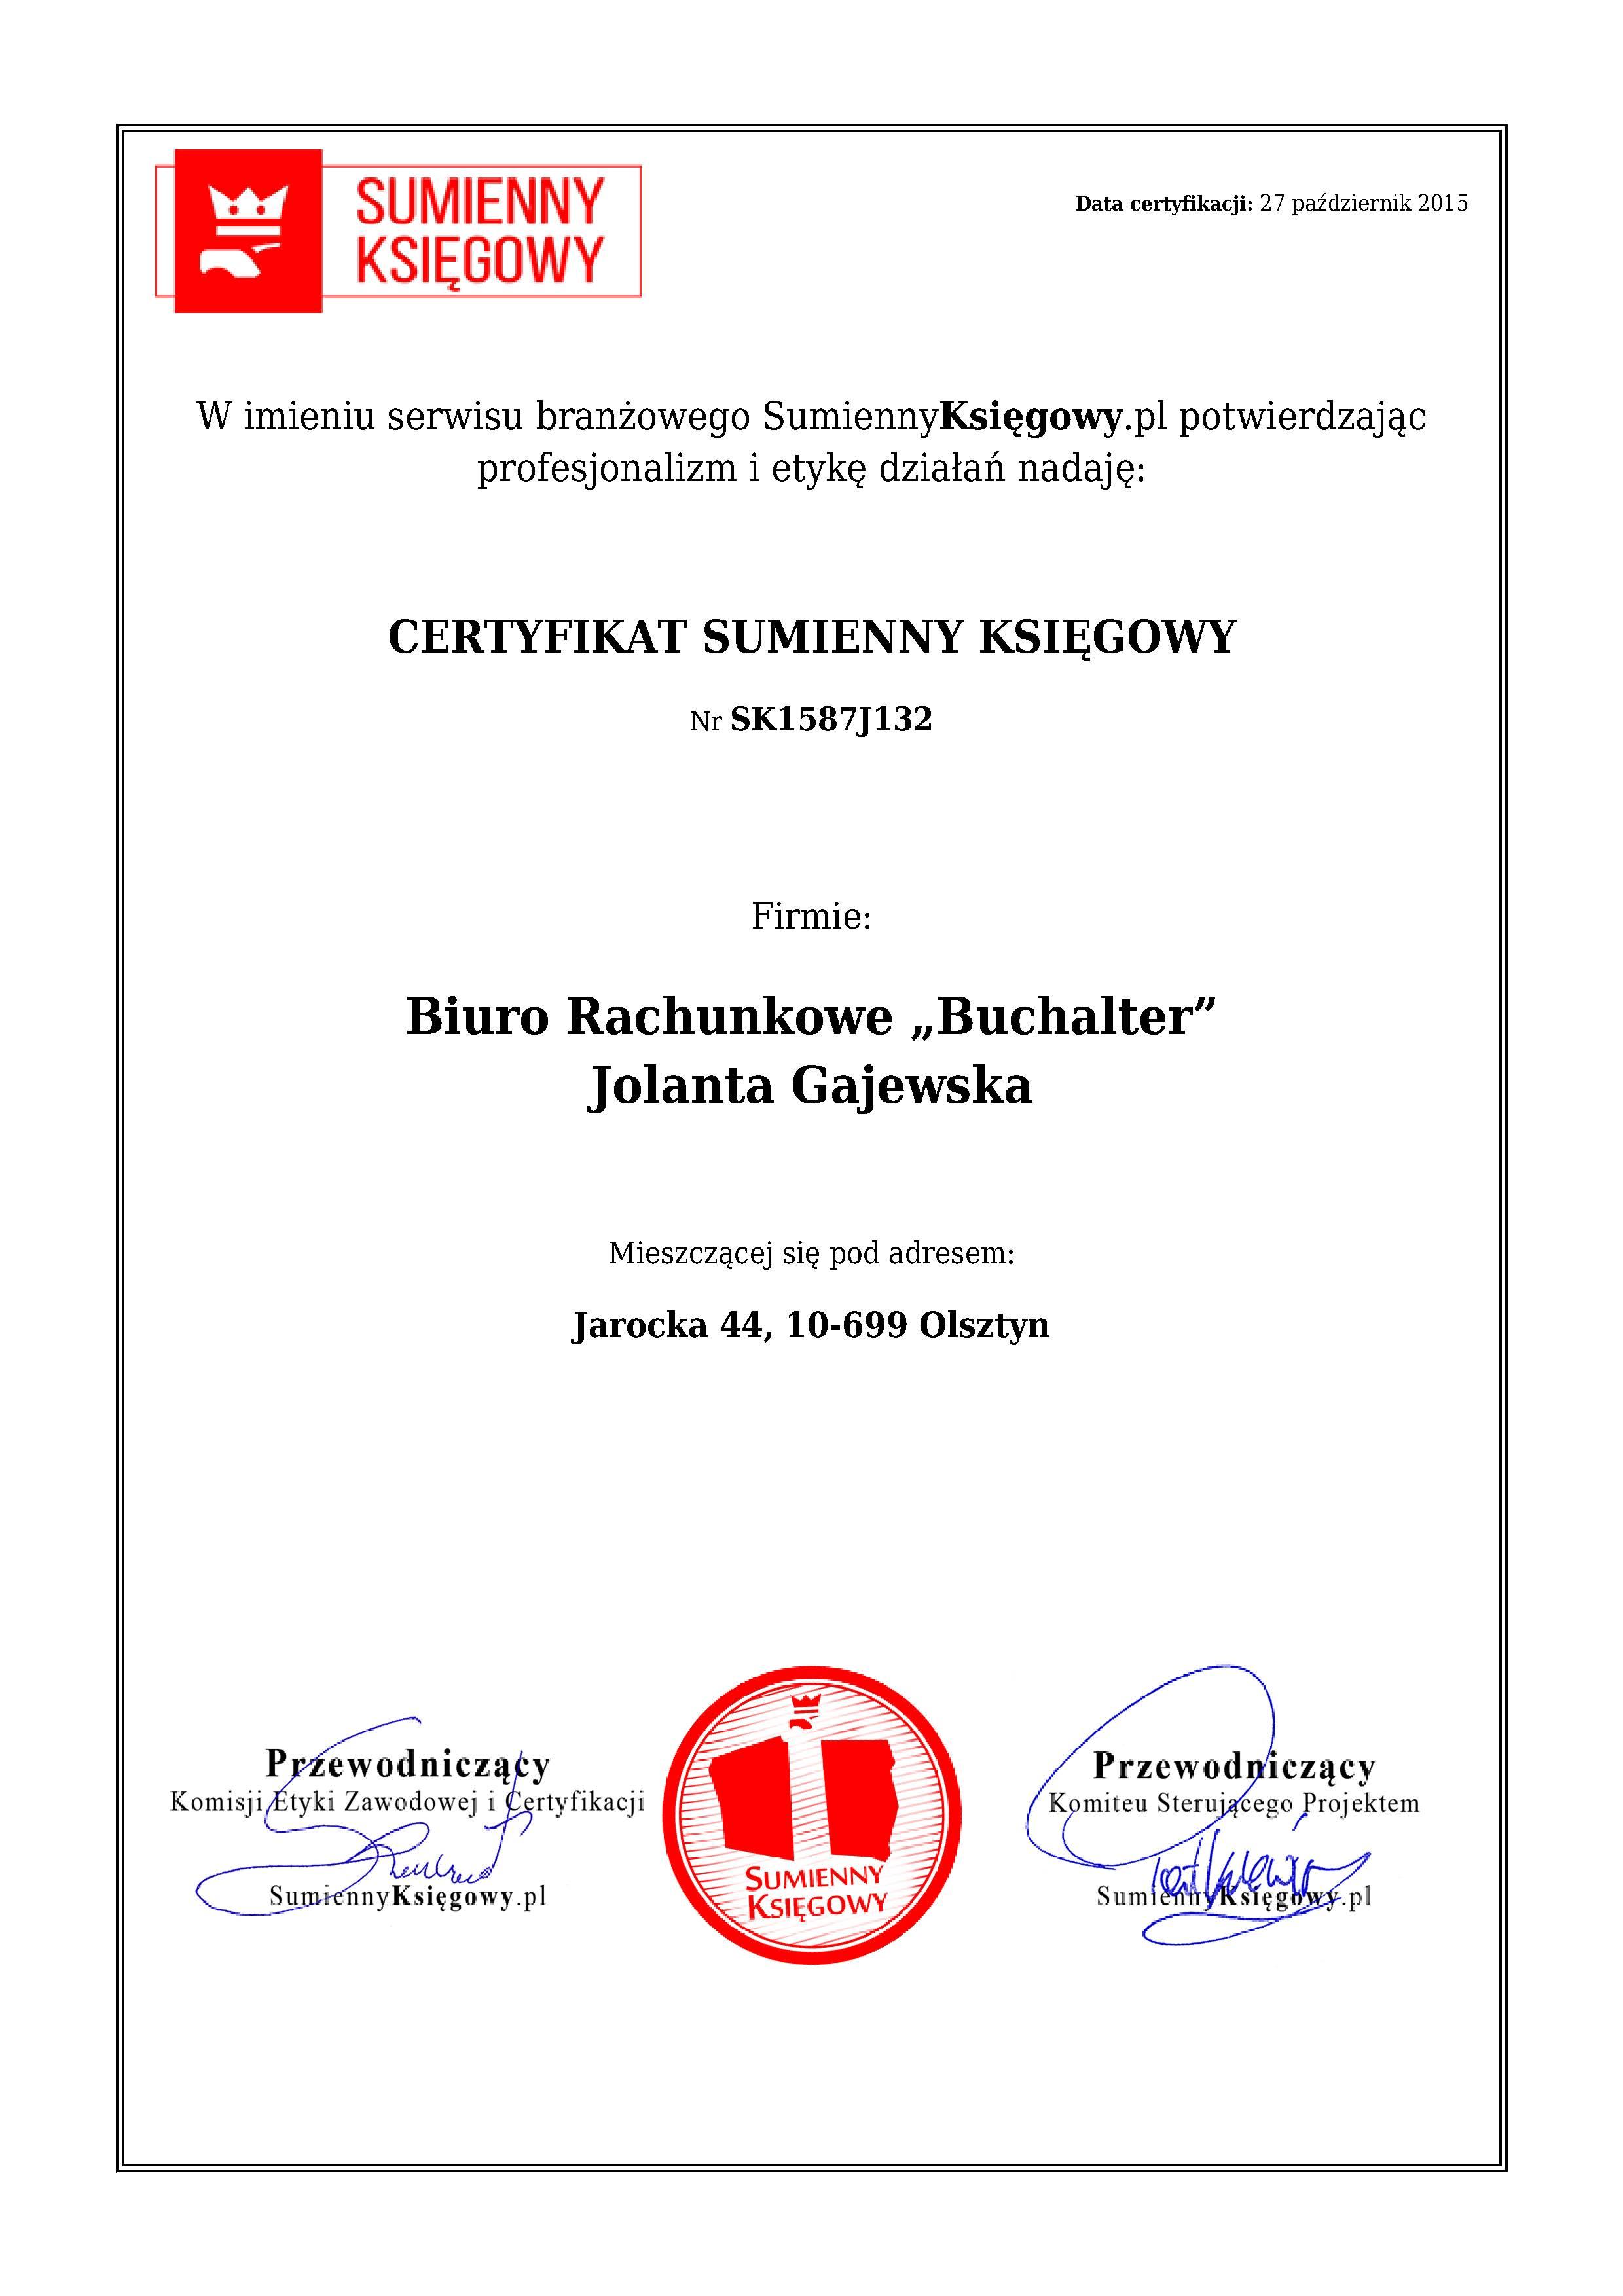 "Certyfikat Biuro Rachunkowe ""Buchalter"" Jolanta Gajewska"